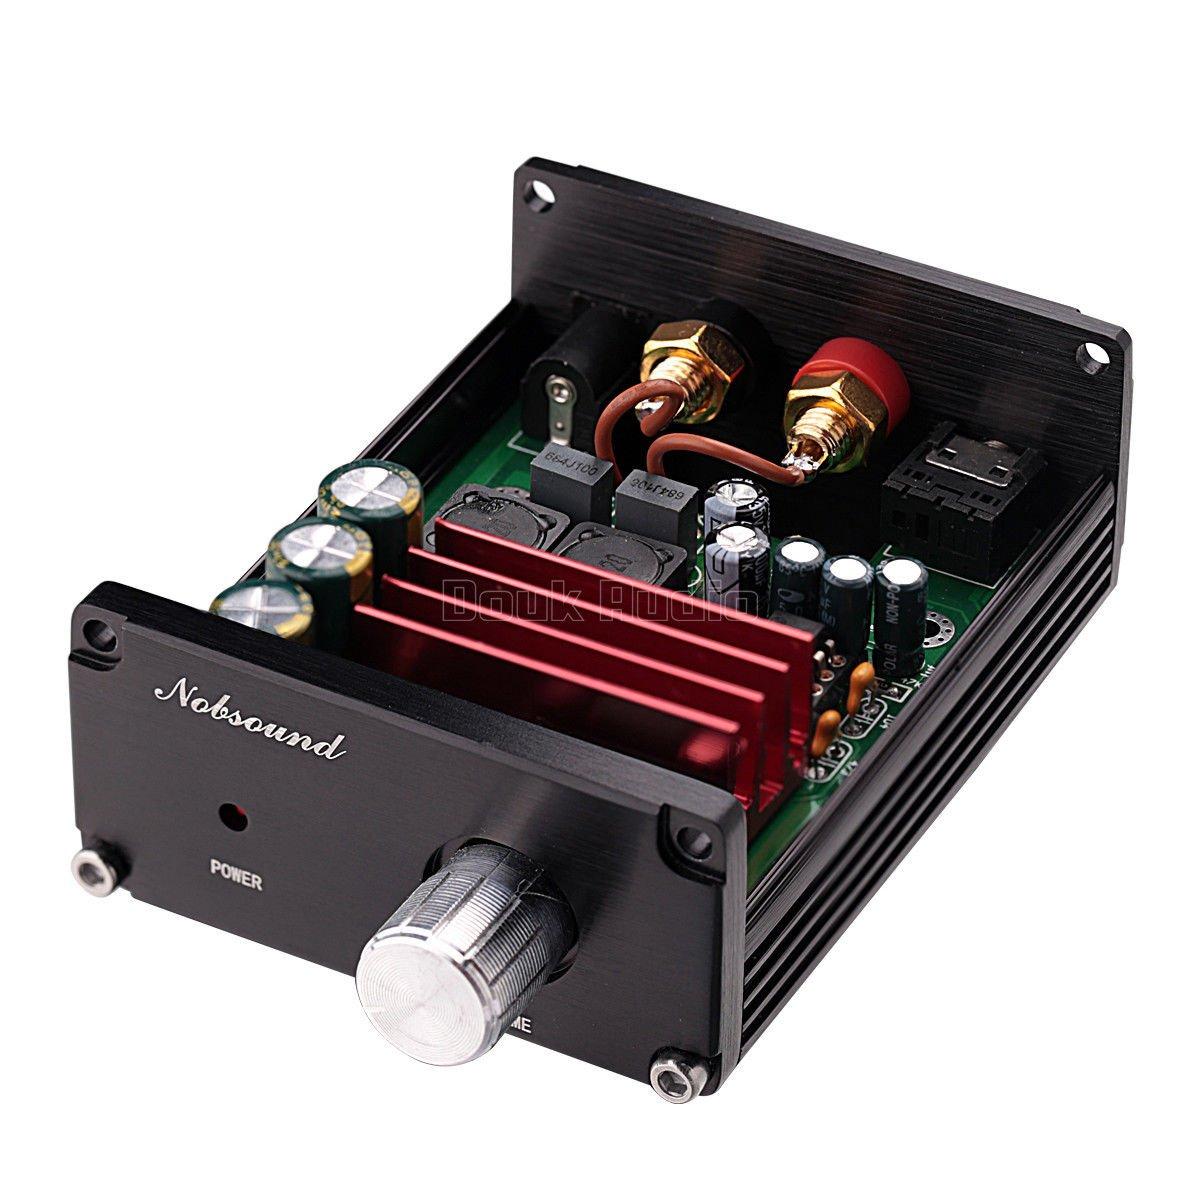 Nobsound 100W Subwoofer Digital Power Amplifier Audio Mini Amp (Subwoofer, Black) by Nobsound